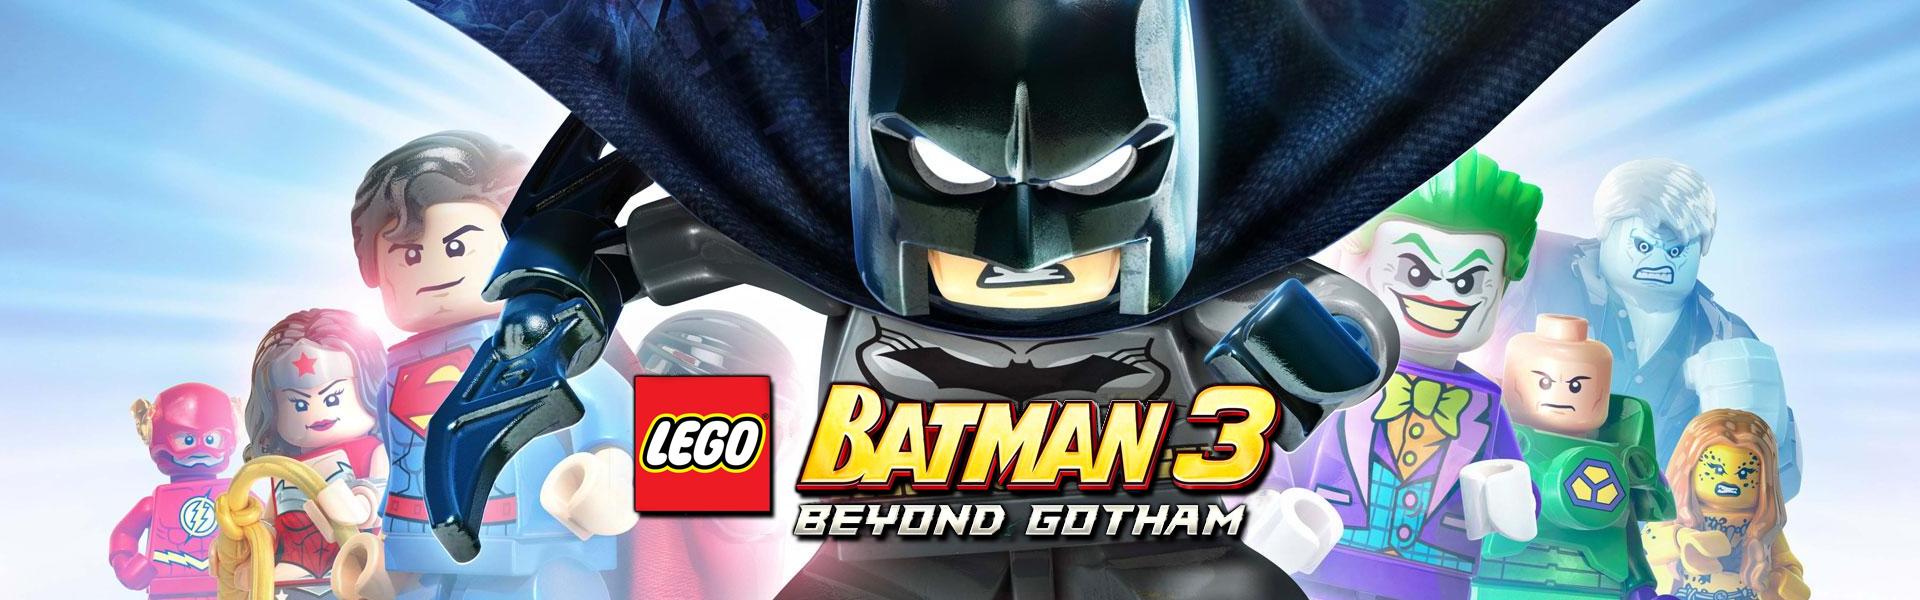 http://robwestwood.com/wp-content/uploads/2013/01/Batman-3-Banner.jpg